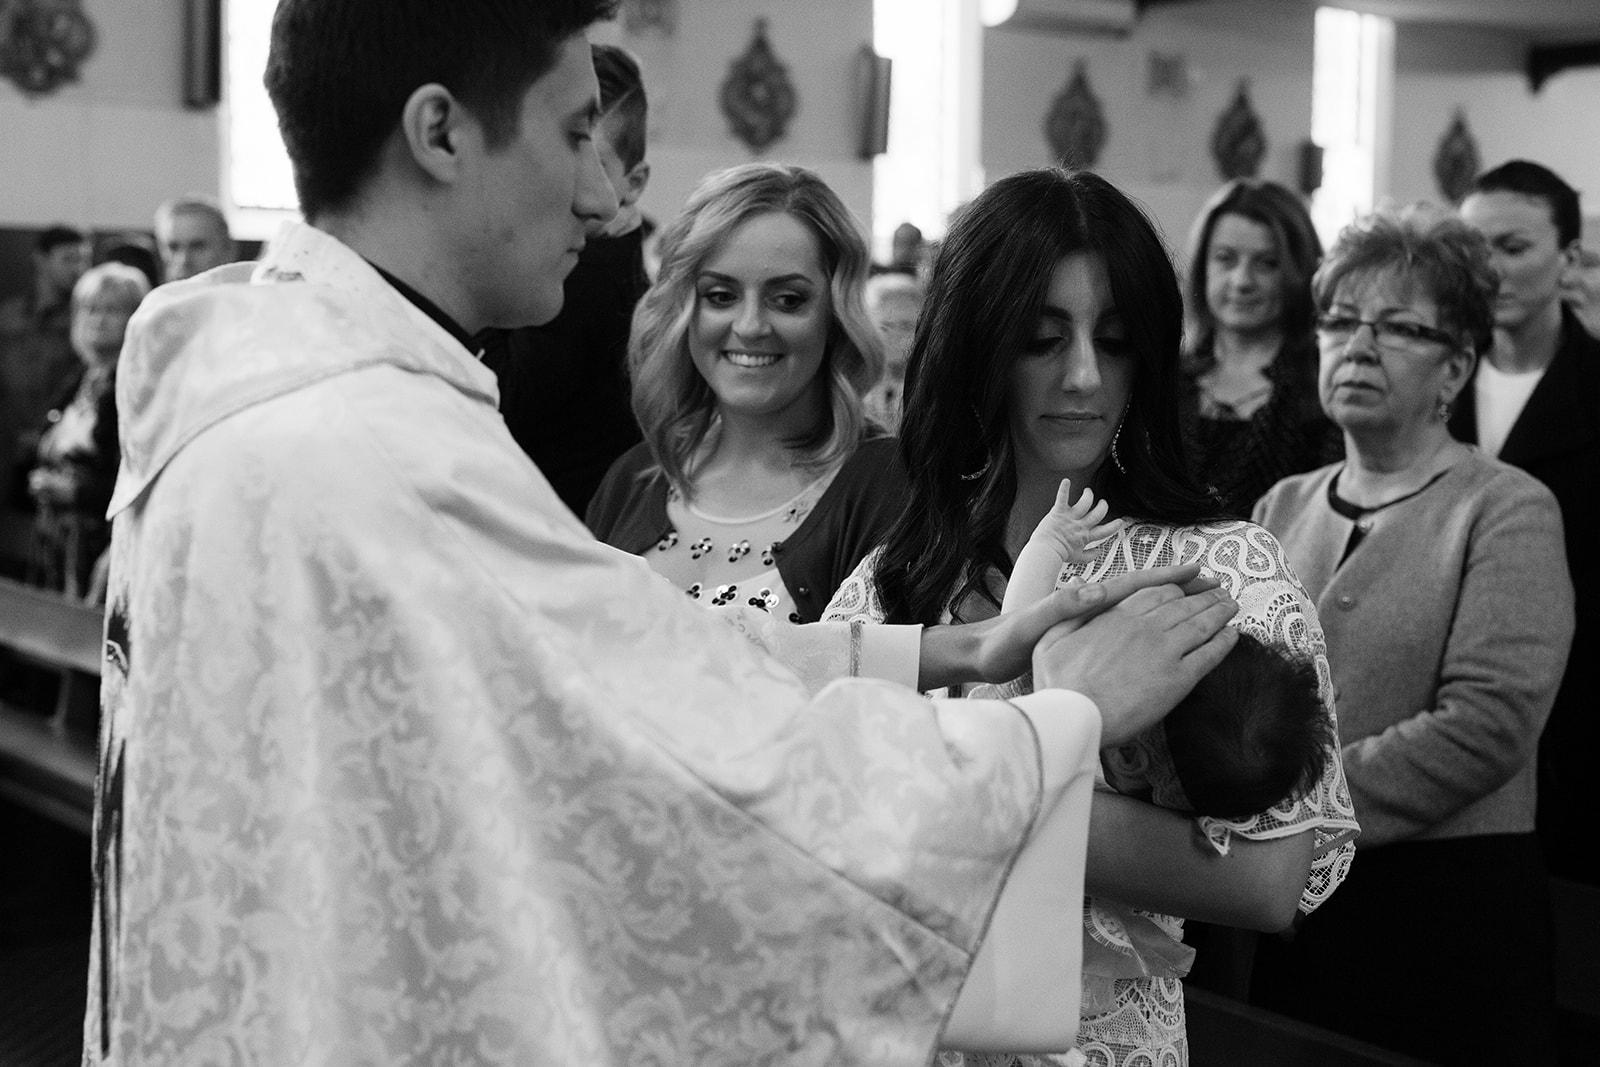 melbourne-christening-photographer,christening-photography-melbourne, orthodox-christening-photography, christening-photography, baptism-photographer, christening-ceremony-photography, nameing-ceremony-photography